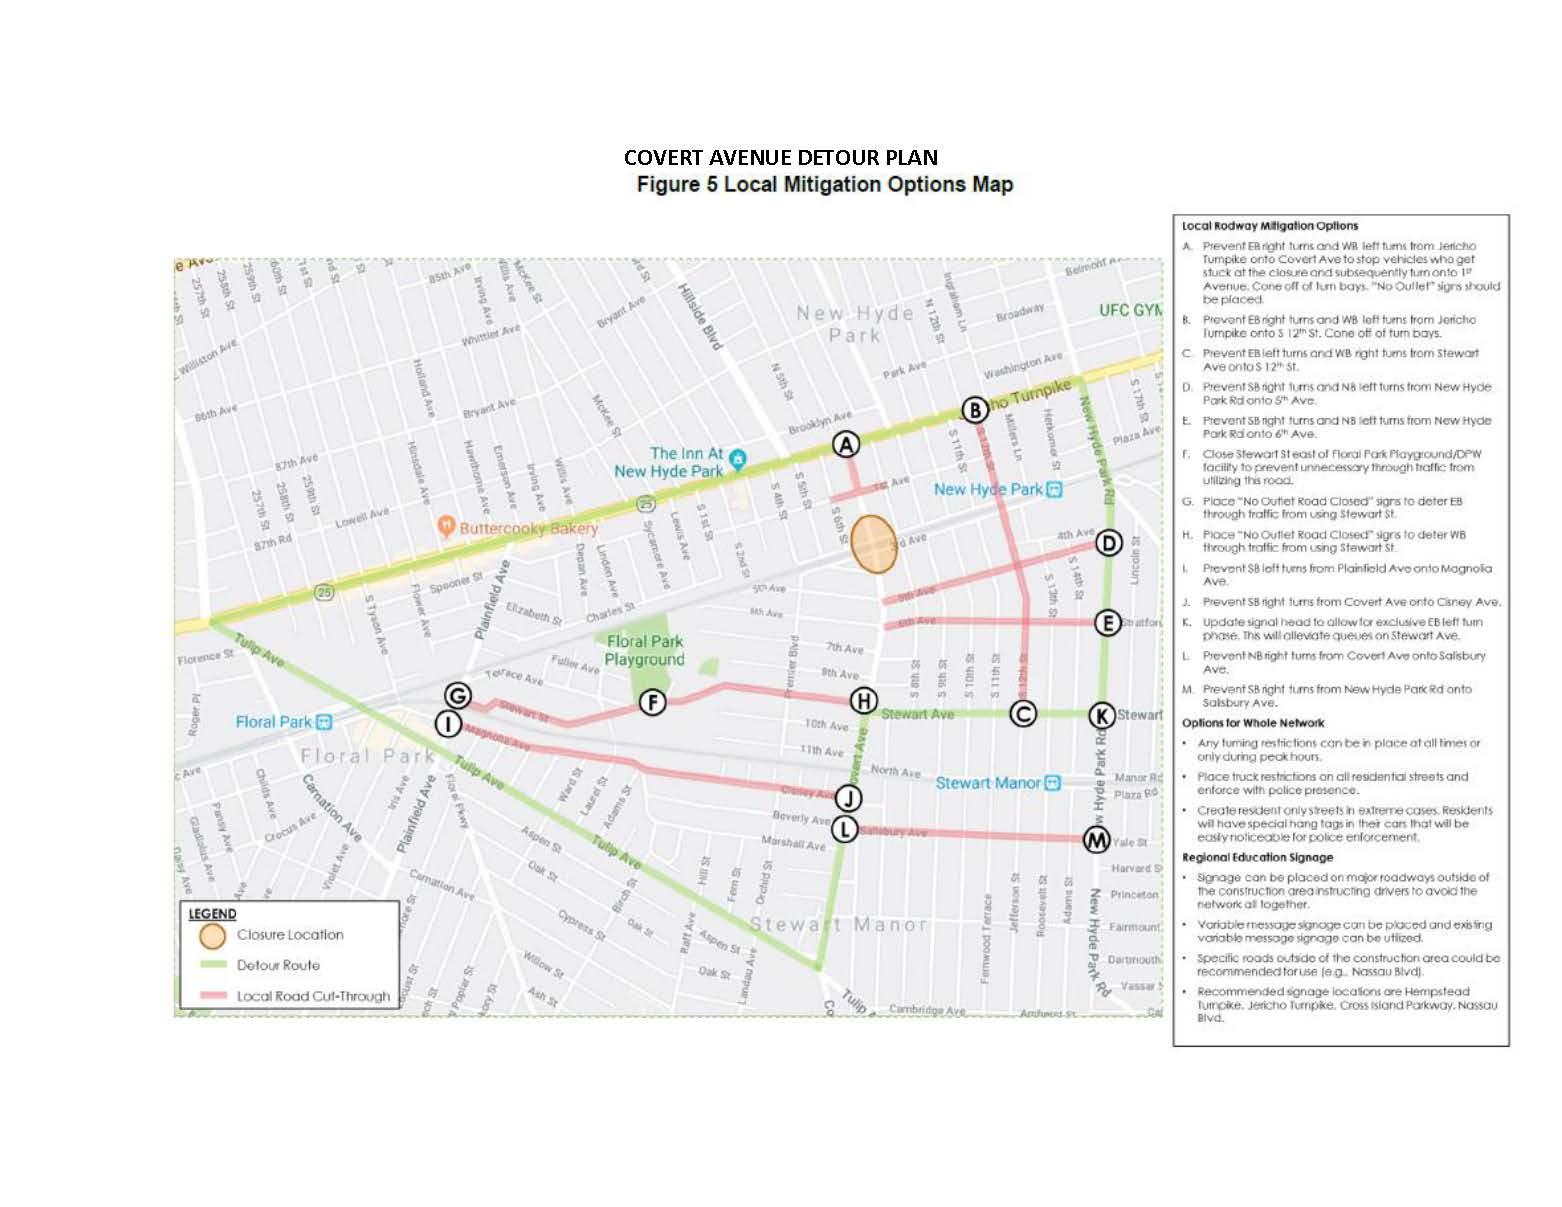 LIRR 3rd Track Information | Village of New Hyde Park, NY